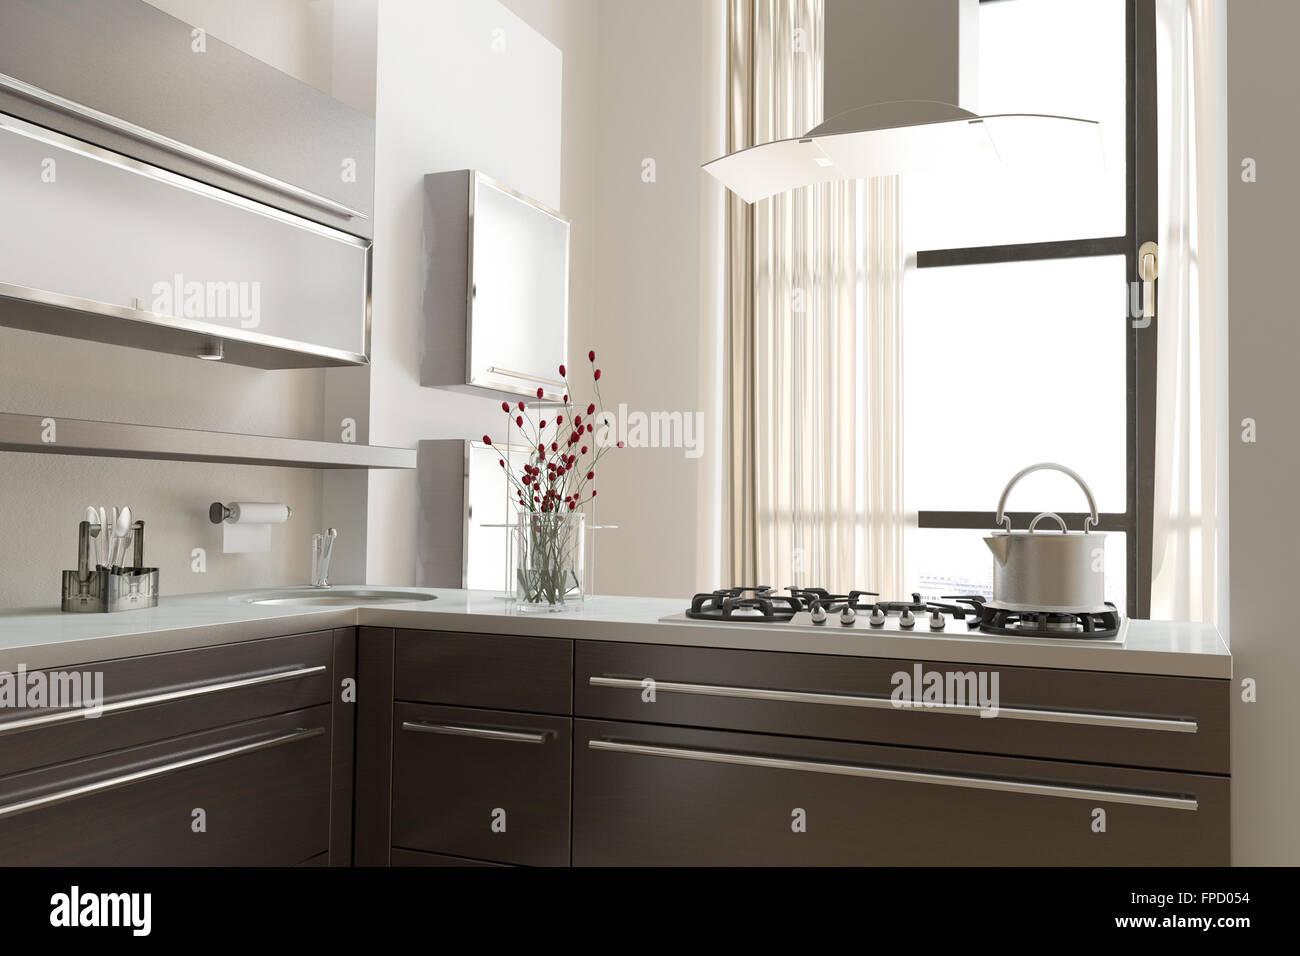 offene k che modern mit theke cg89 startupjobsfa. Black Bedroom Furniture Sets. Home Design Ideas